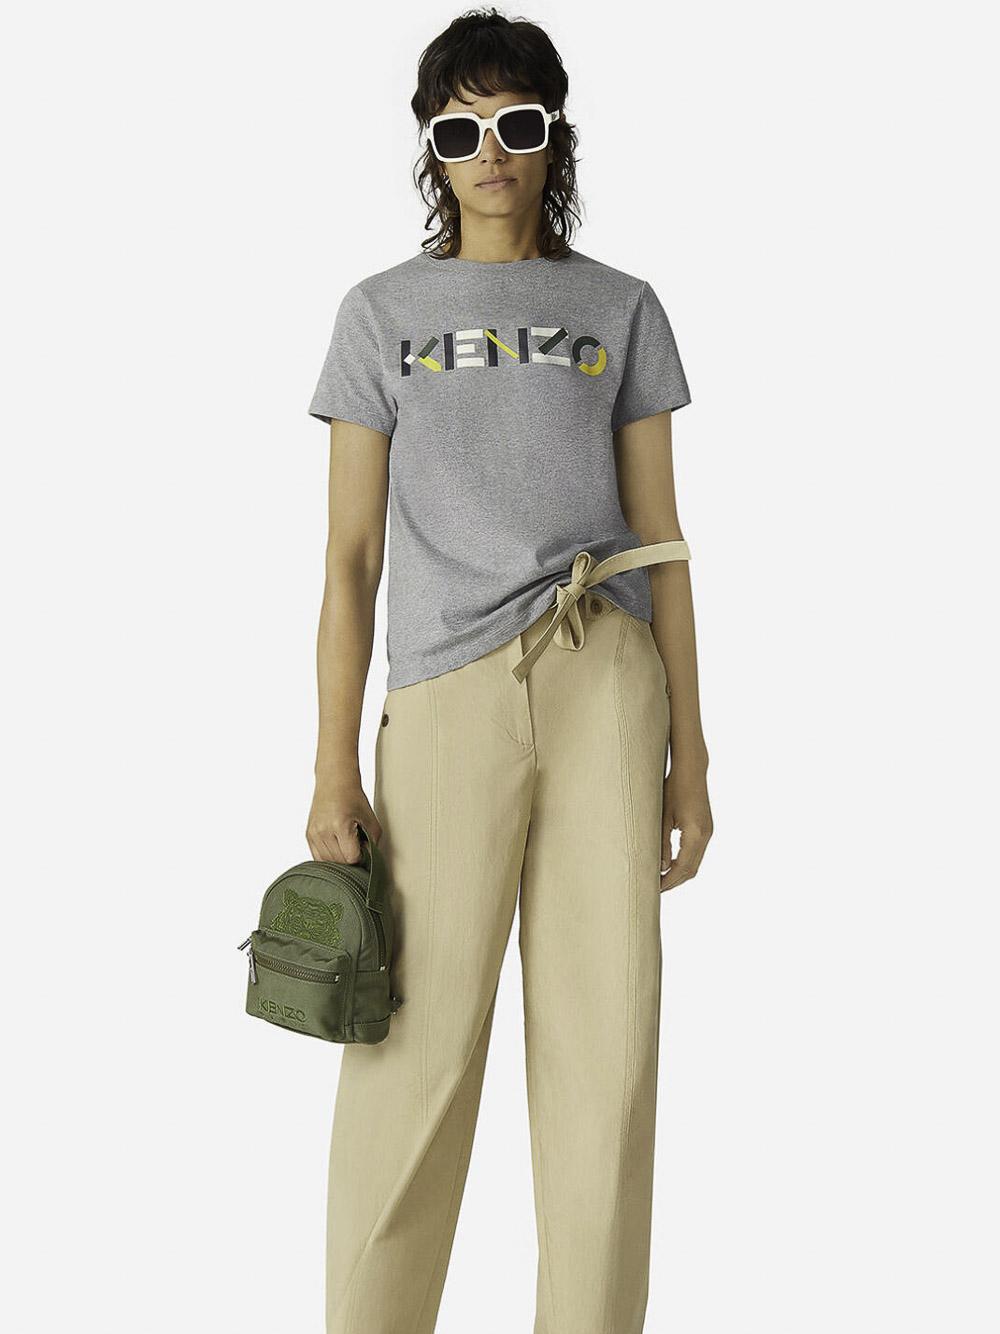 KENZO Μπλούζα t-shirt 2TS8404SA-95 ΓΚΡΙ